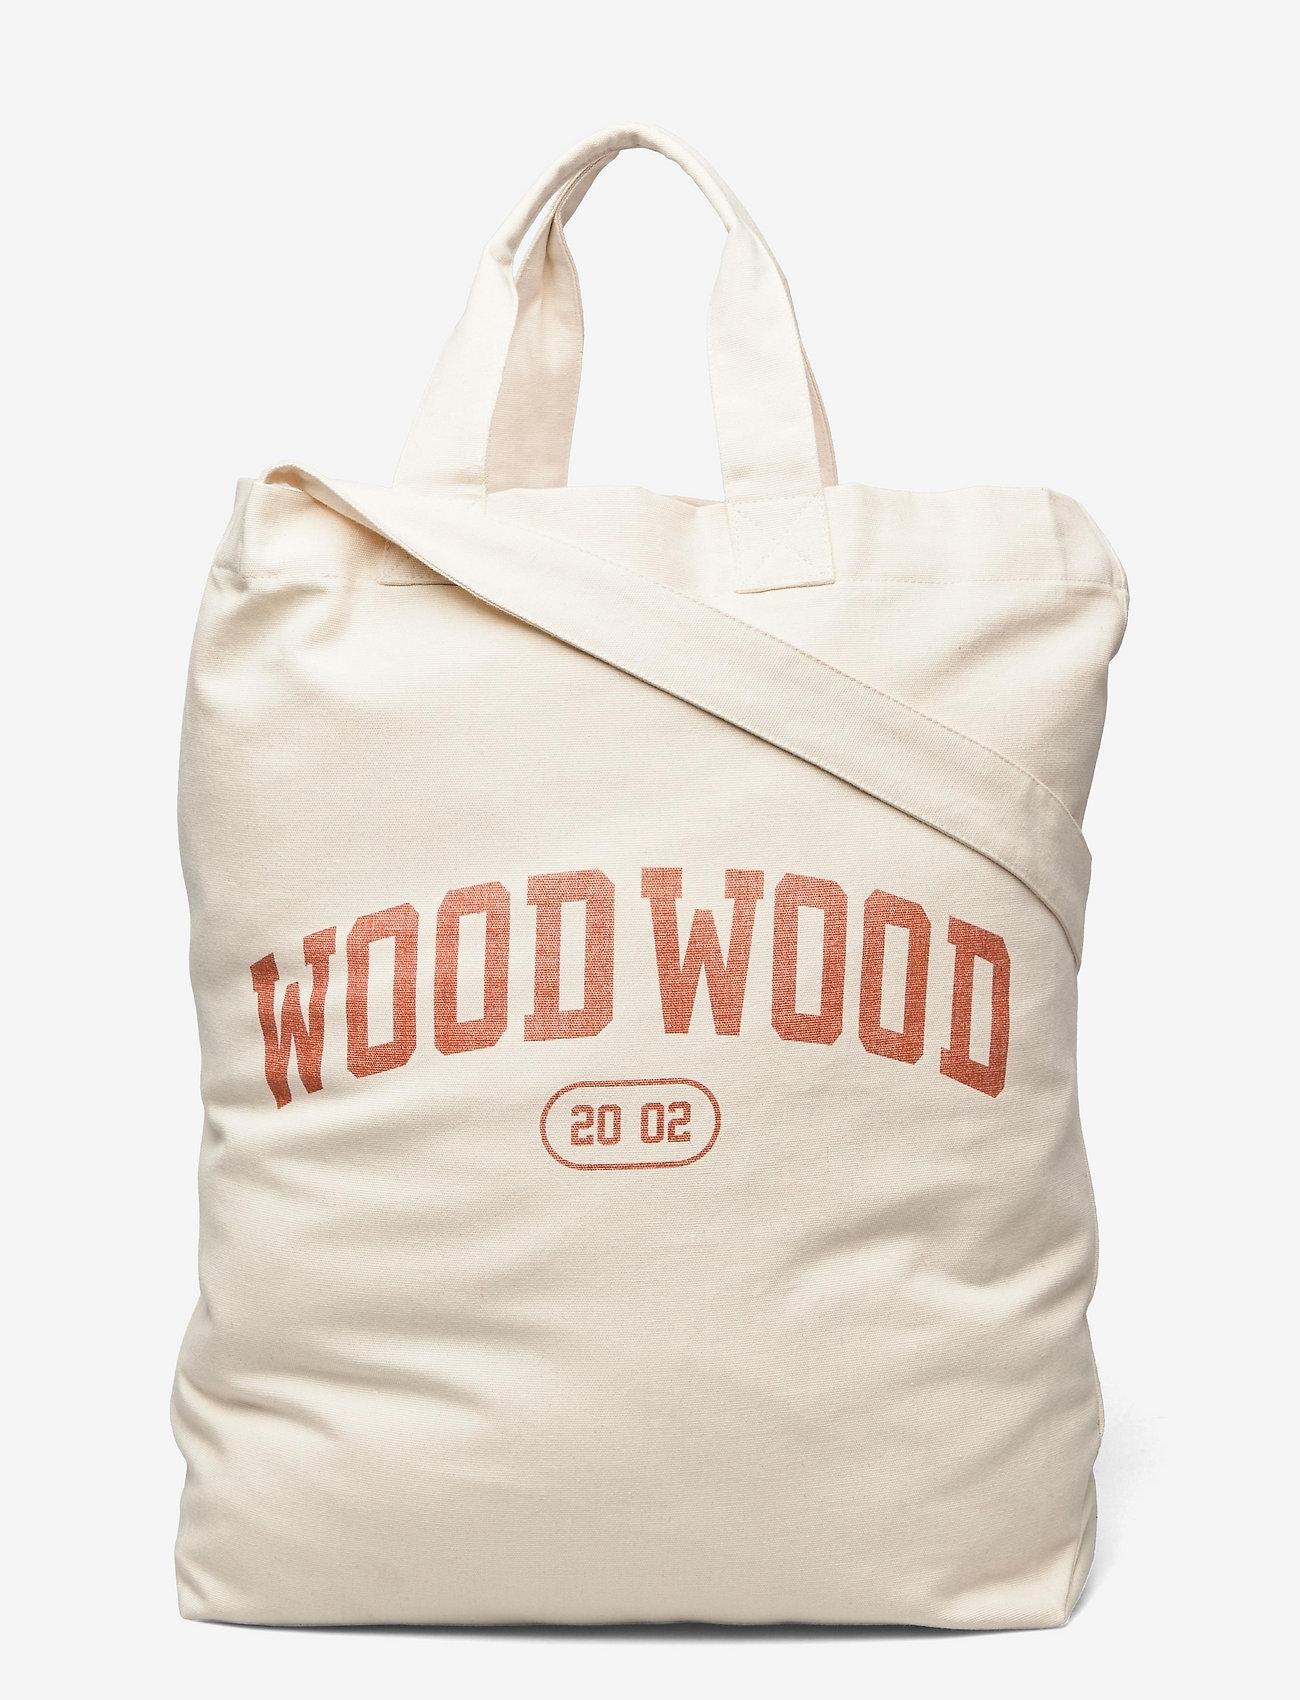 Wood Wood - High canvas shopper - shoppers - blood orange - 0